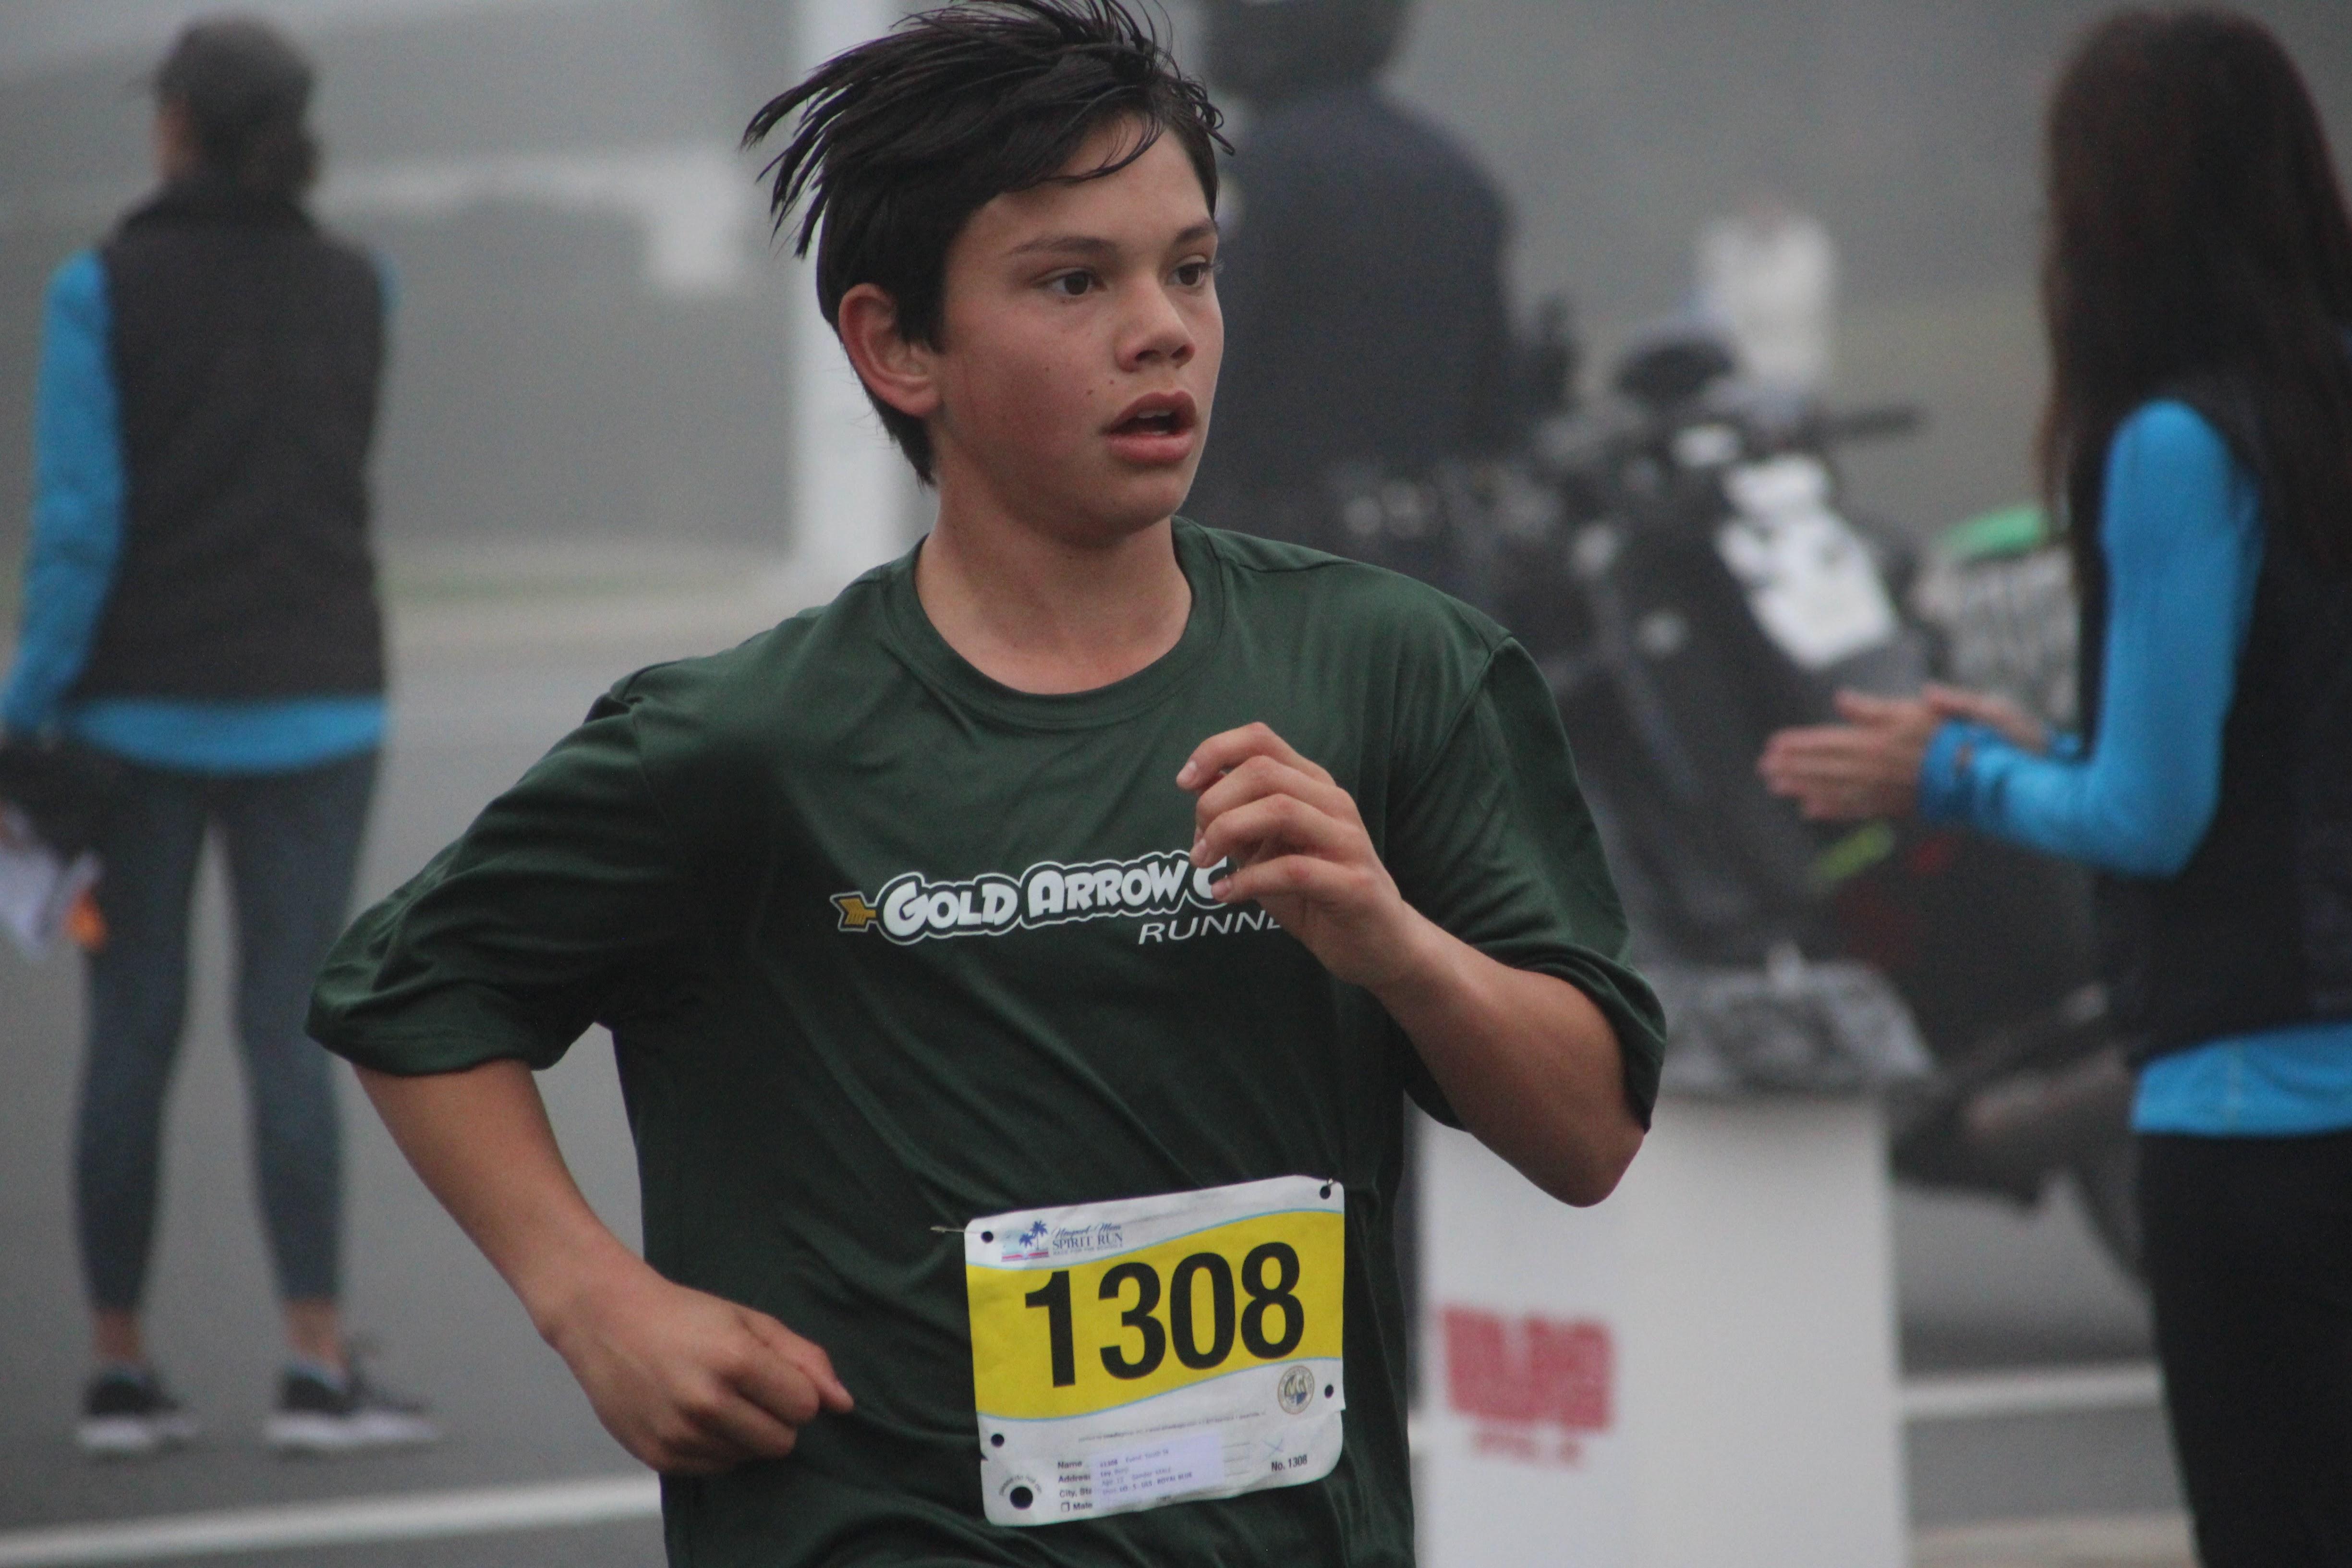 GAC Runners are headed to the Spirit Run!